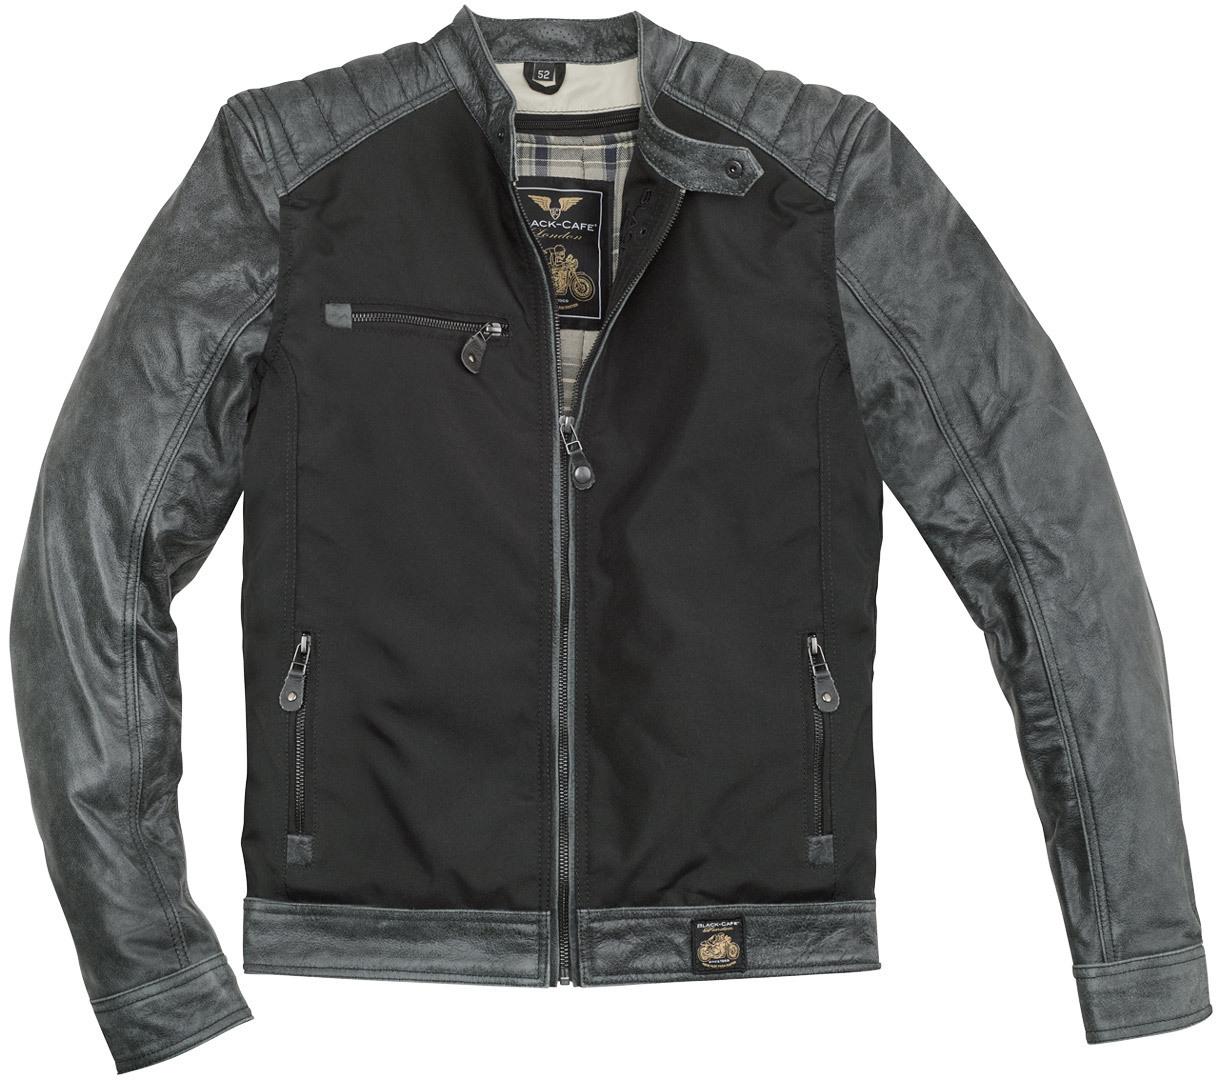 Black-Cafe London Johannesburg Motorrad Leder- / Textiljacke, schwarz-grau, Größe 56, schwarz-grau, Größe 56